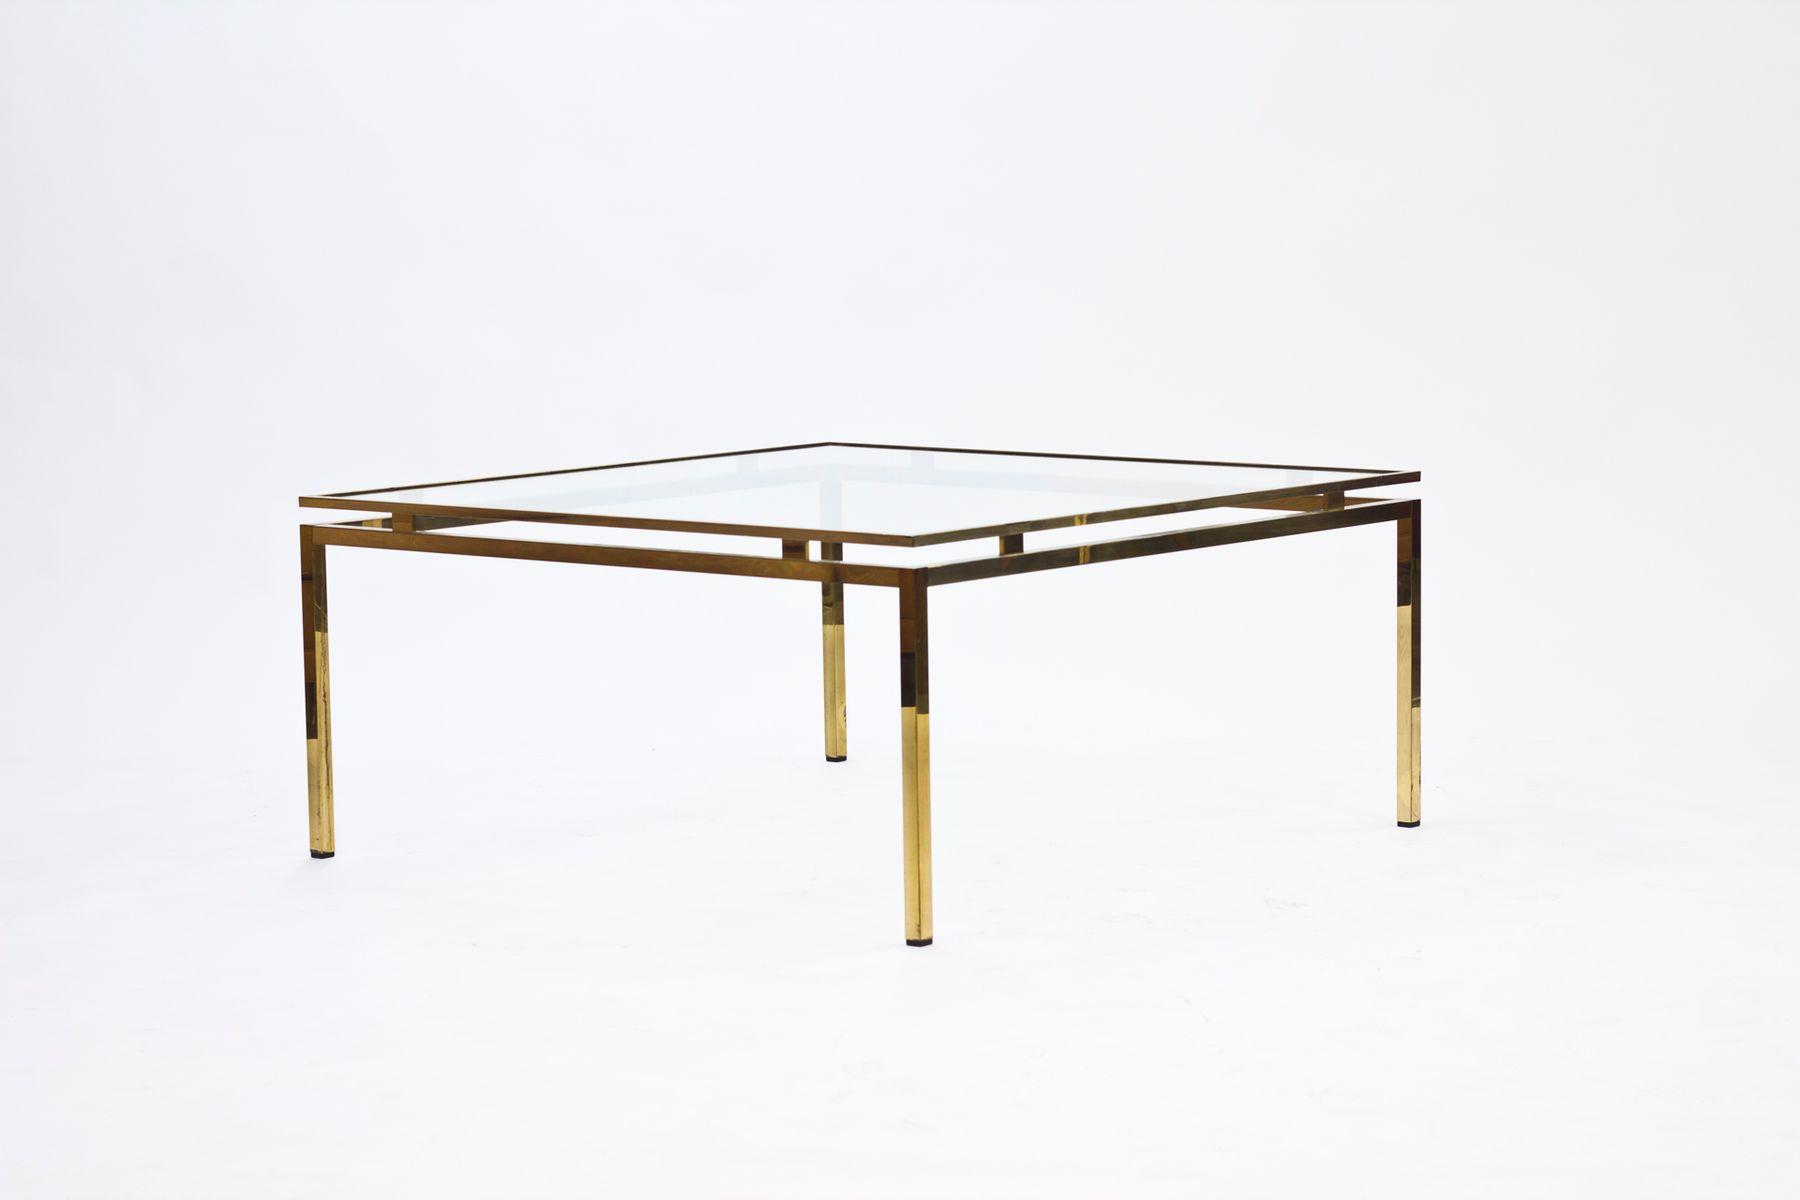 table basse vintage en verre et laiton su de 1970s en vente sur pamono. Black Bedroom Furniture Sets. Home Design Ideas